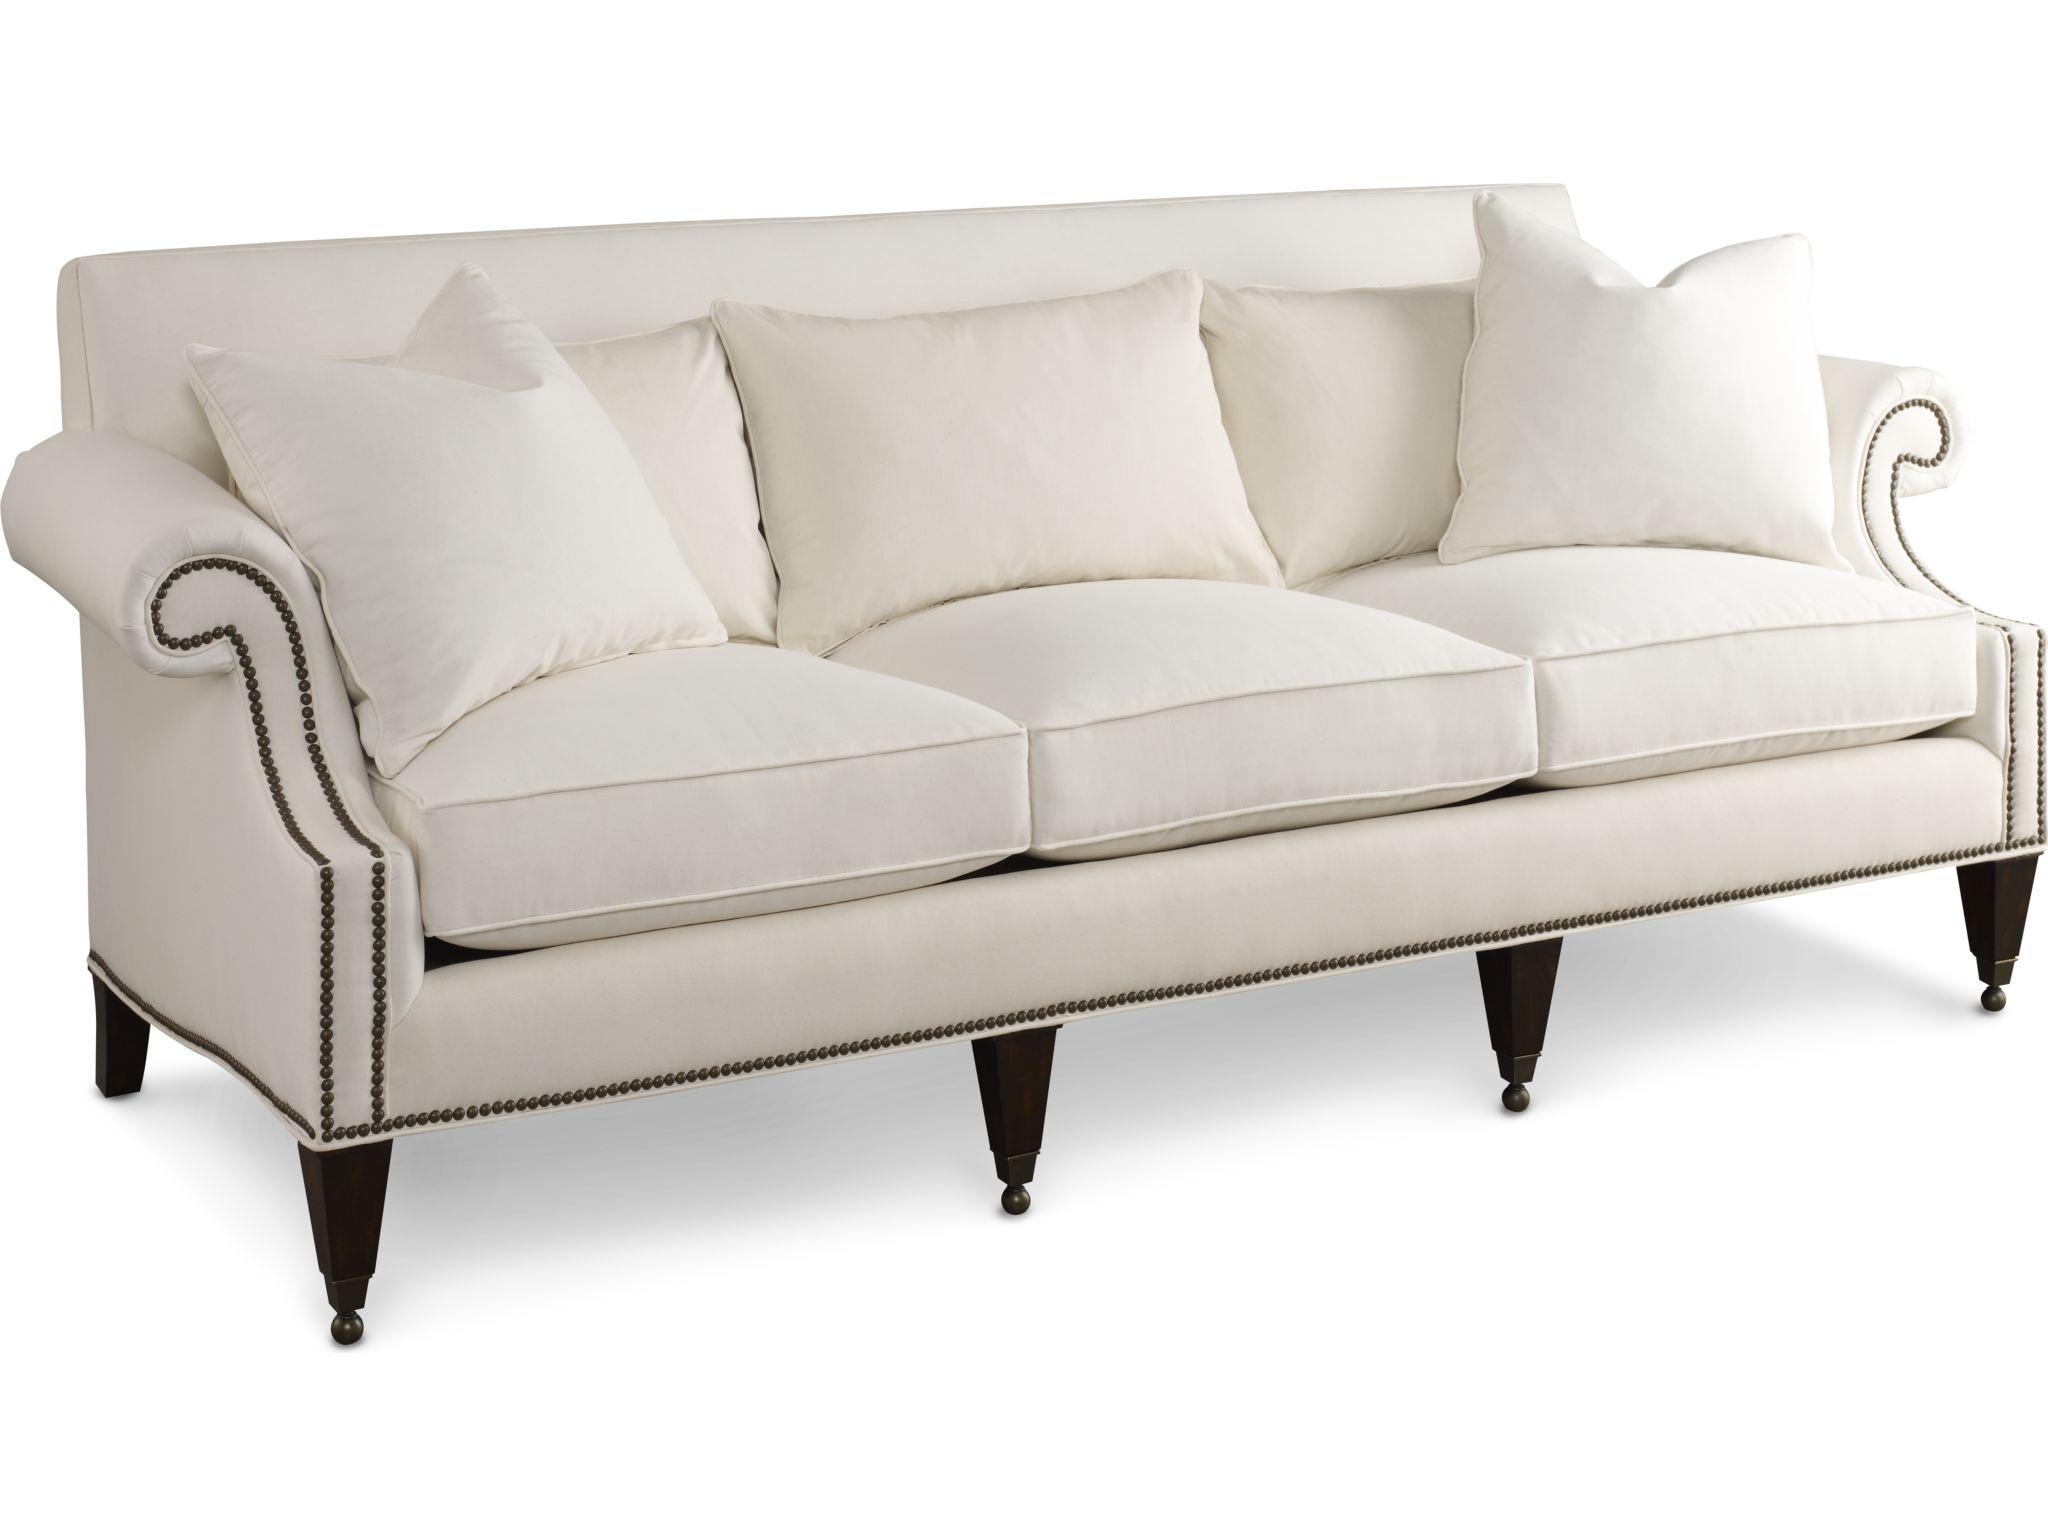 schnadig sofa 9090 full sleeper leather thomasville living room ella 1718 11 whitley